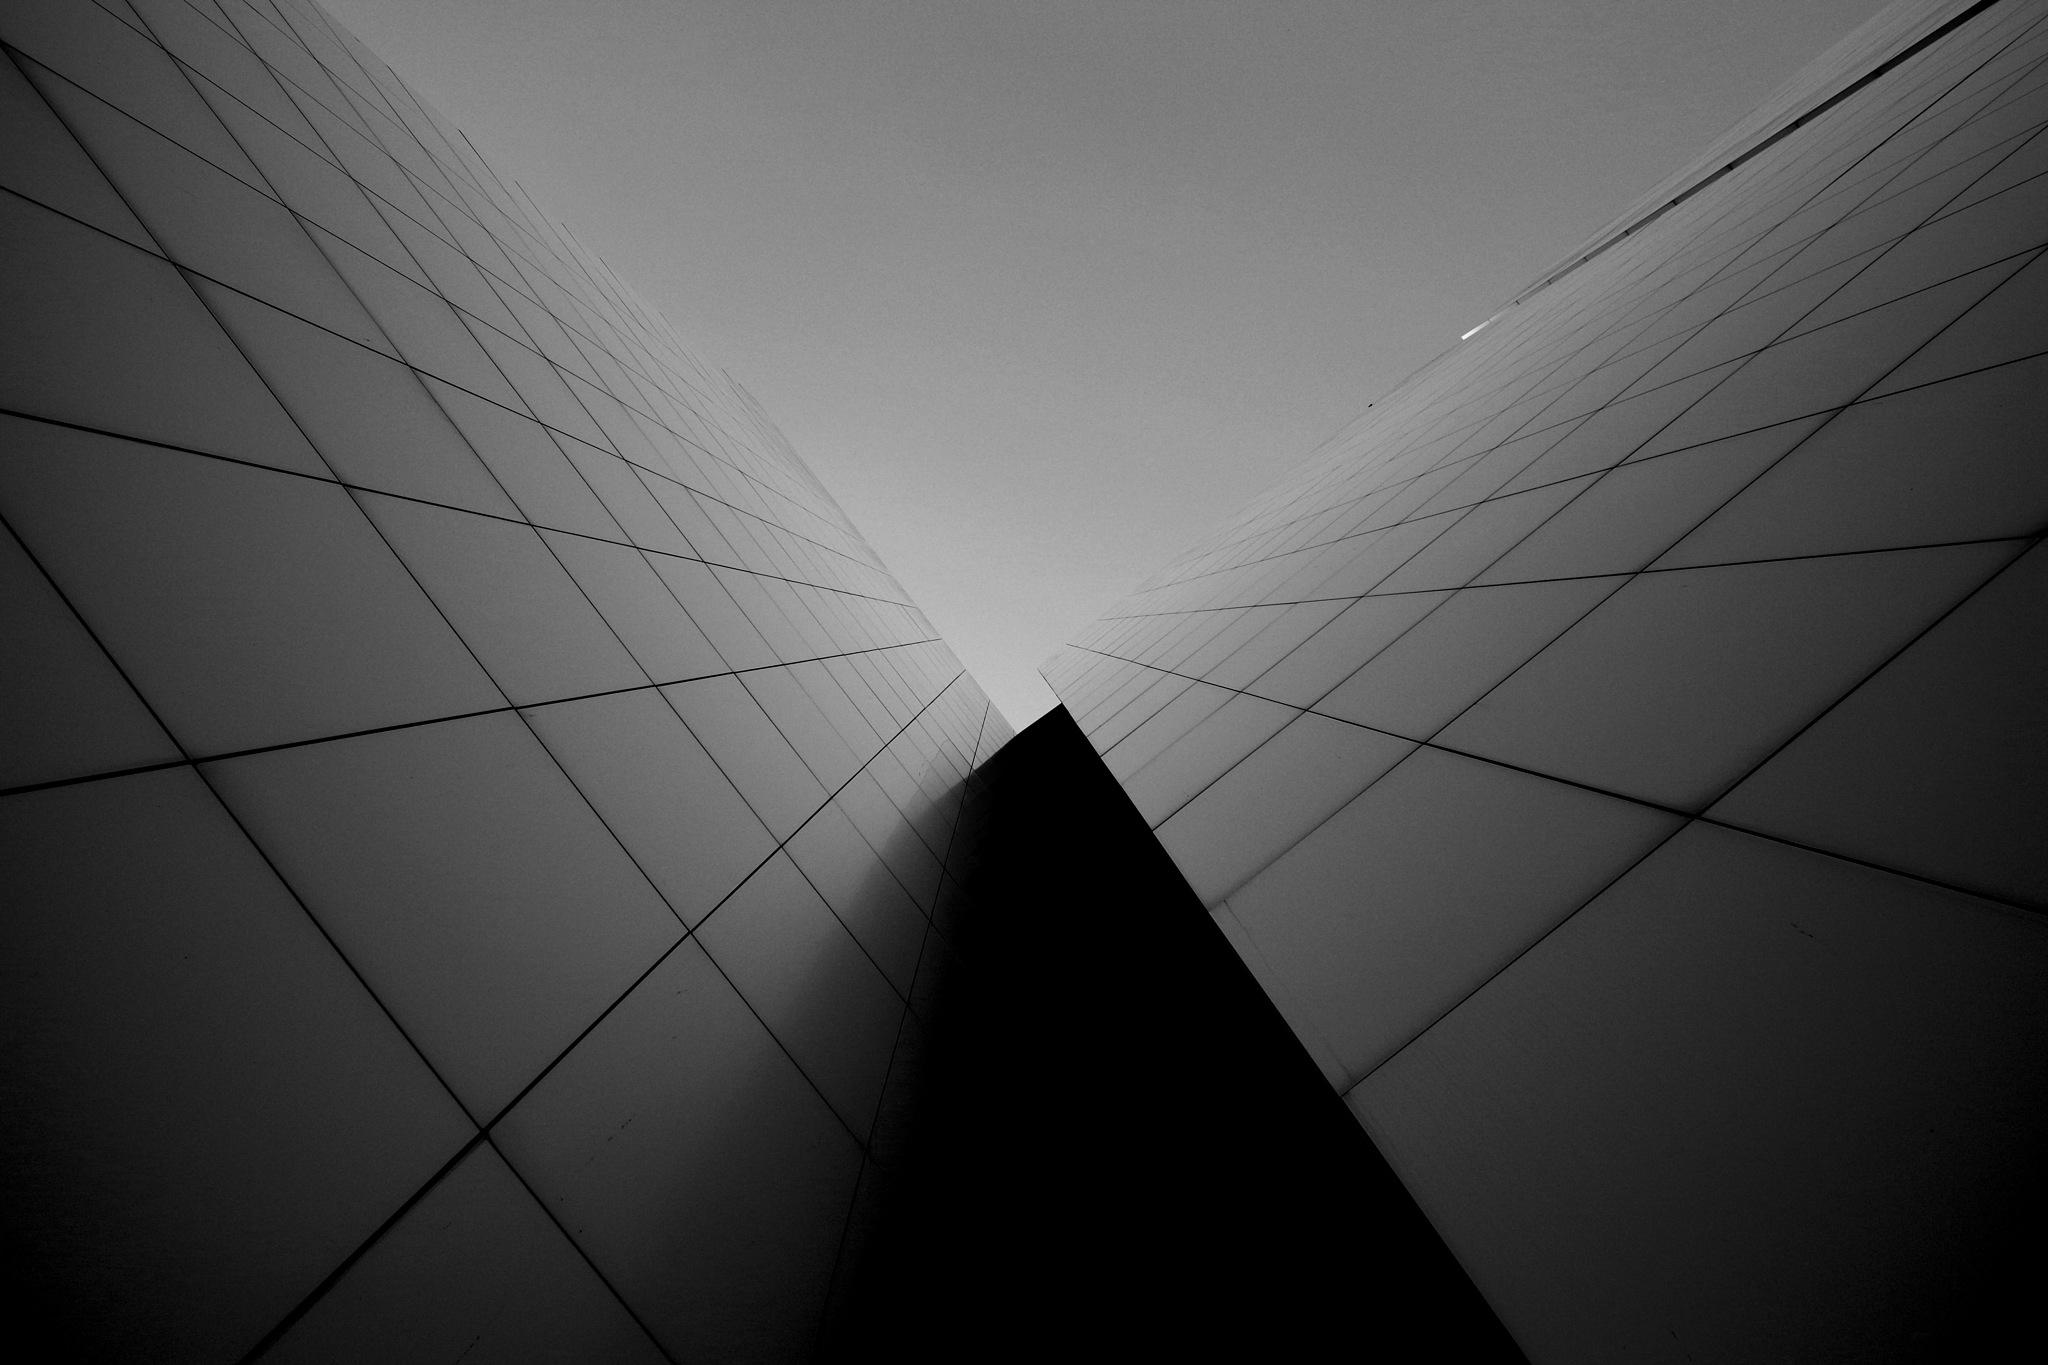 Architektur 215 L 002 KS1 2016 sw by Frank S aus HB